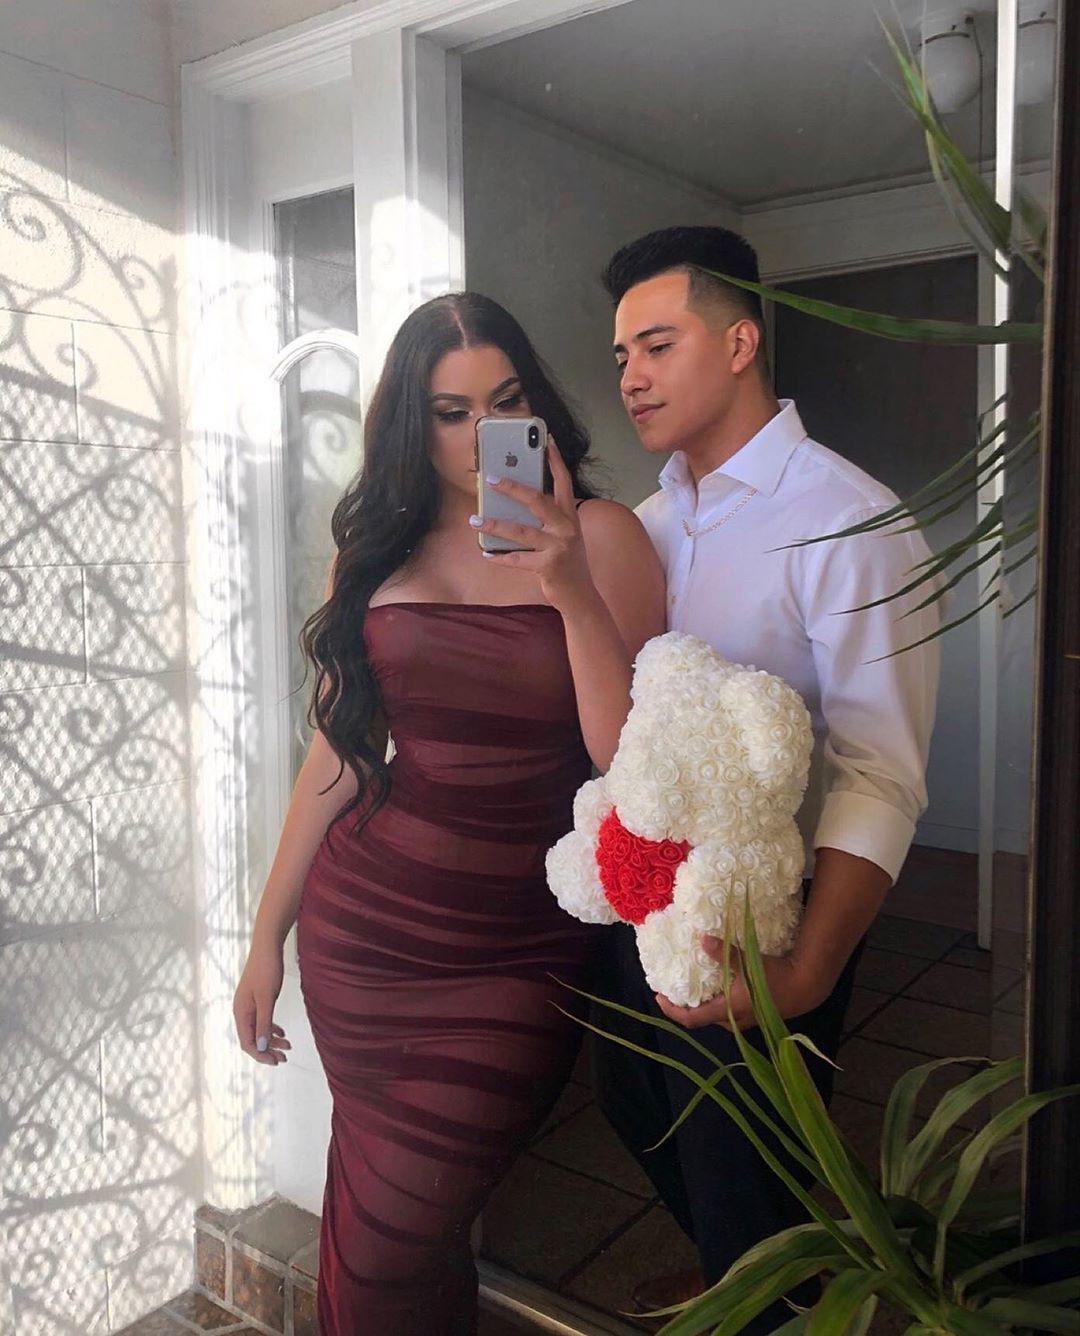 Alondra Mendoza bridal clothing, wedding dress formal wear colour outfit